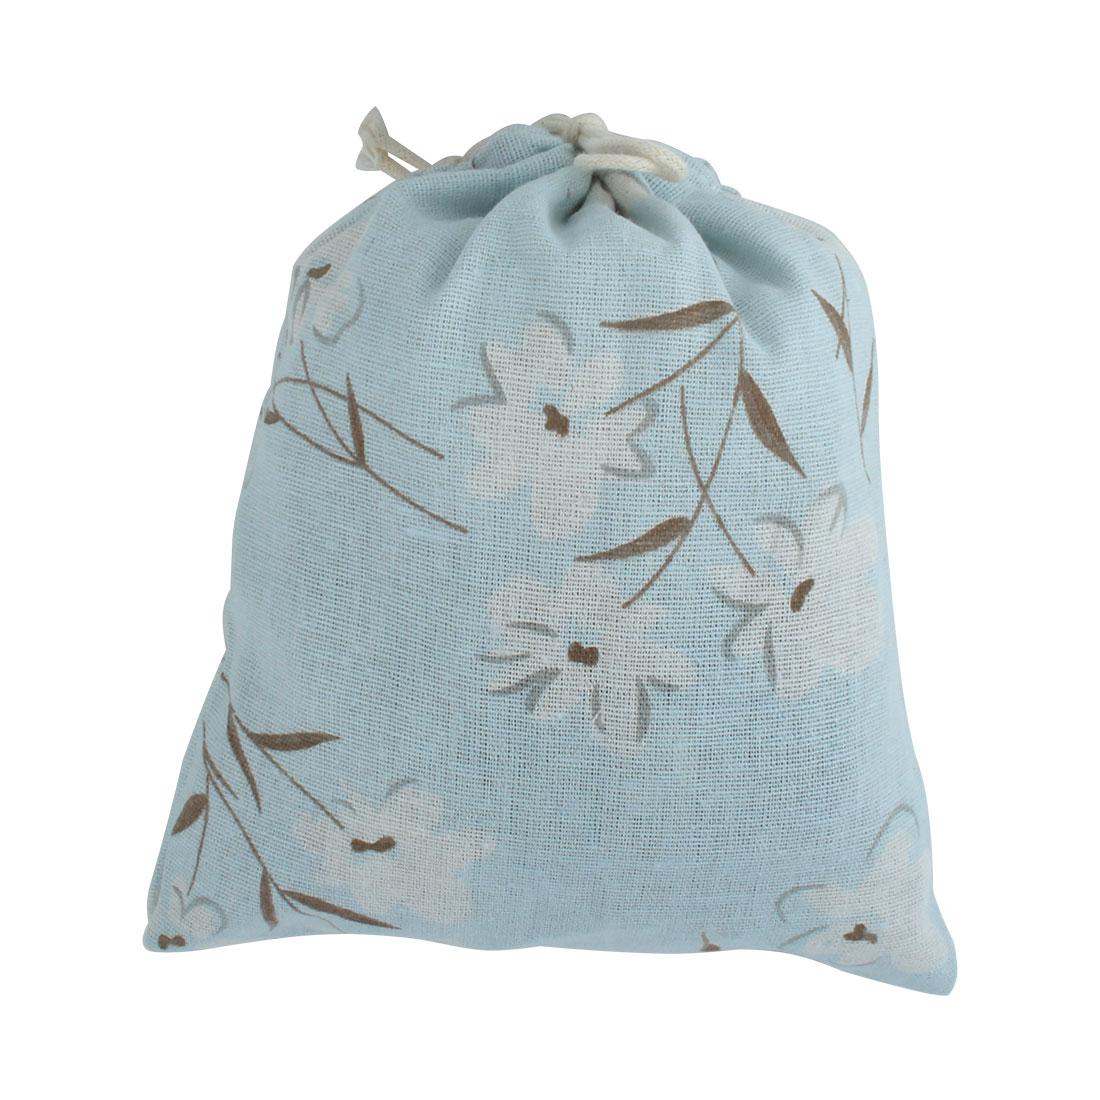 Outdoor Travel Cotton Linen Flower Printed Storage Pouch Bag Light Blue Medium